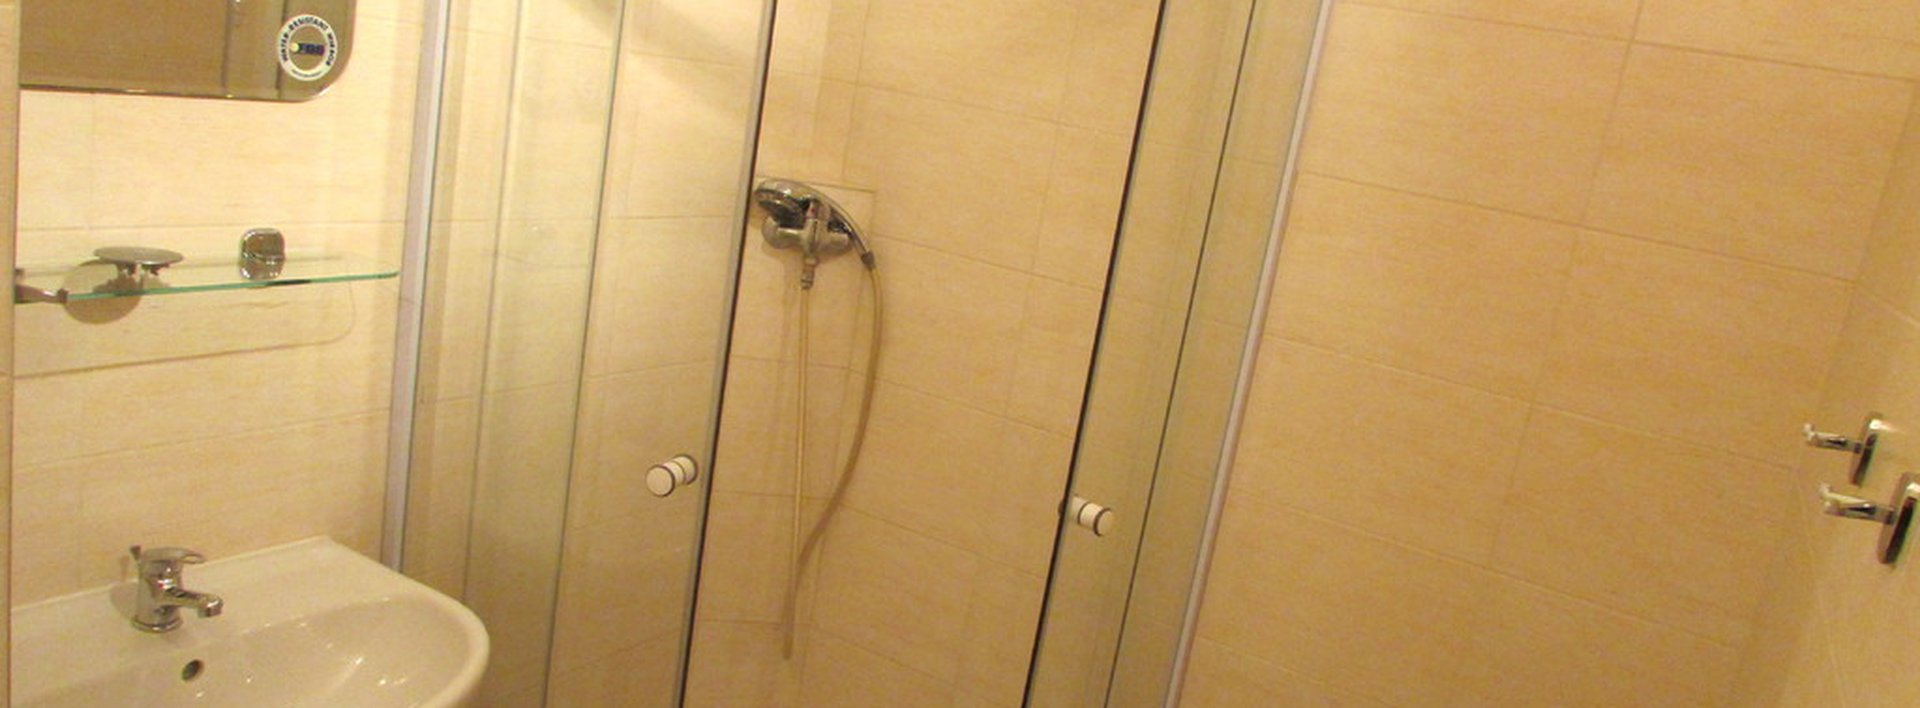 Pronájem bytu 2+1, 44m² - Liberec, Ruprechtice, Ev.č.: N47809